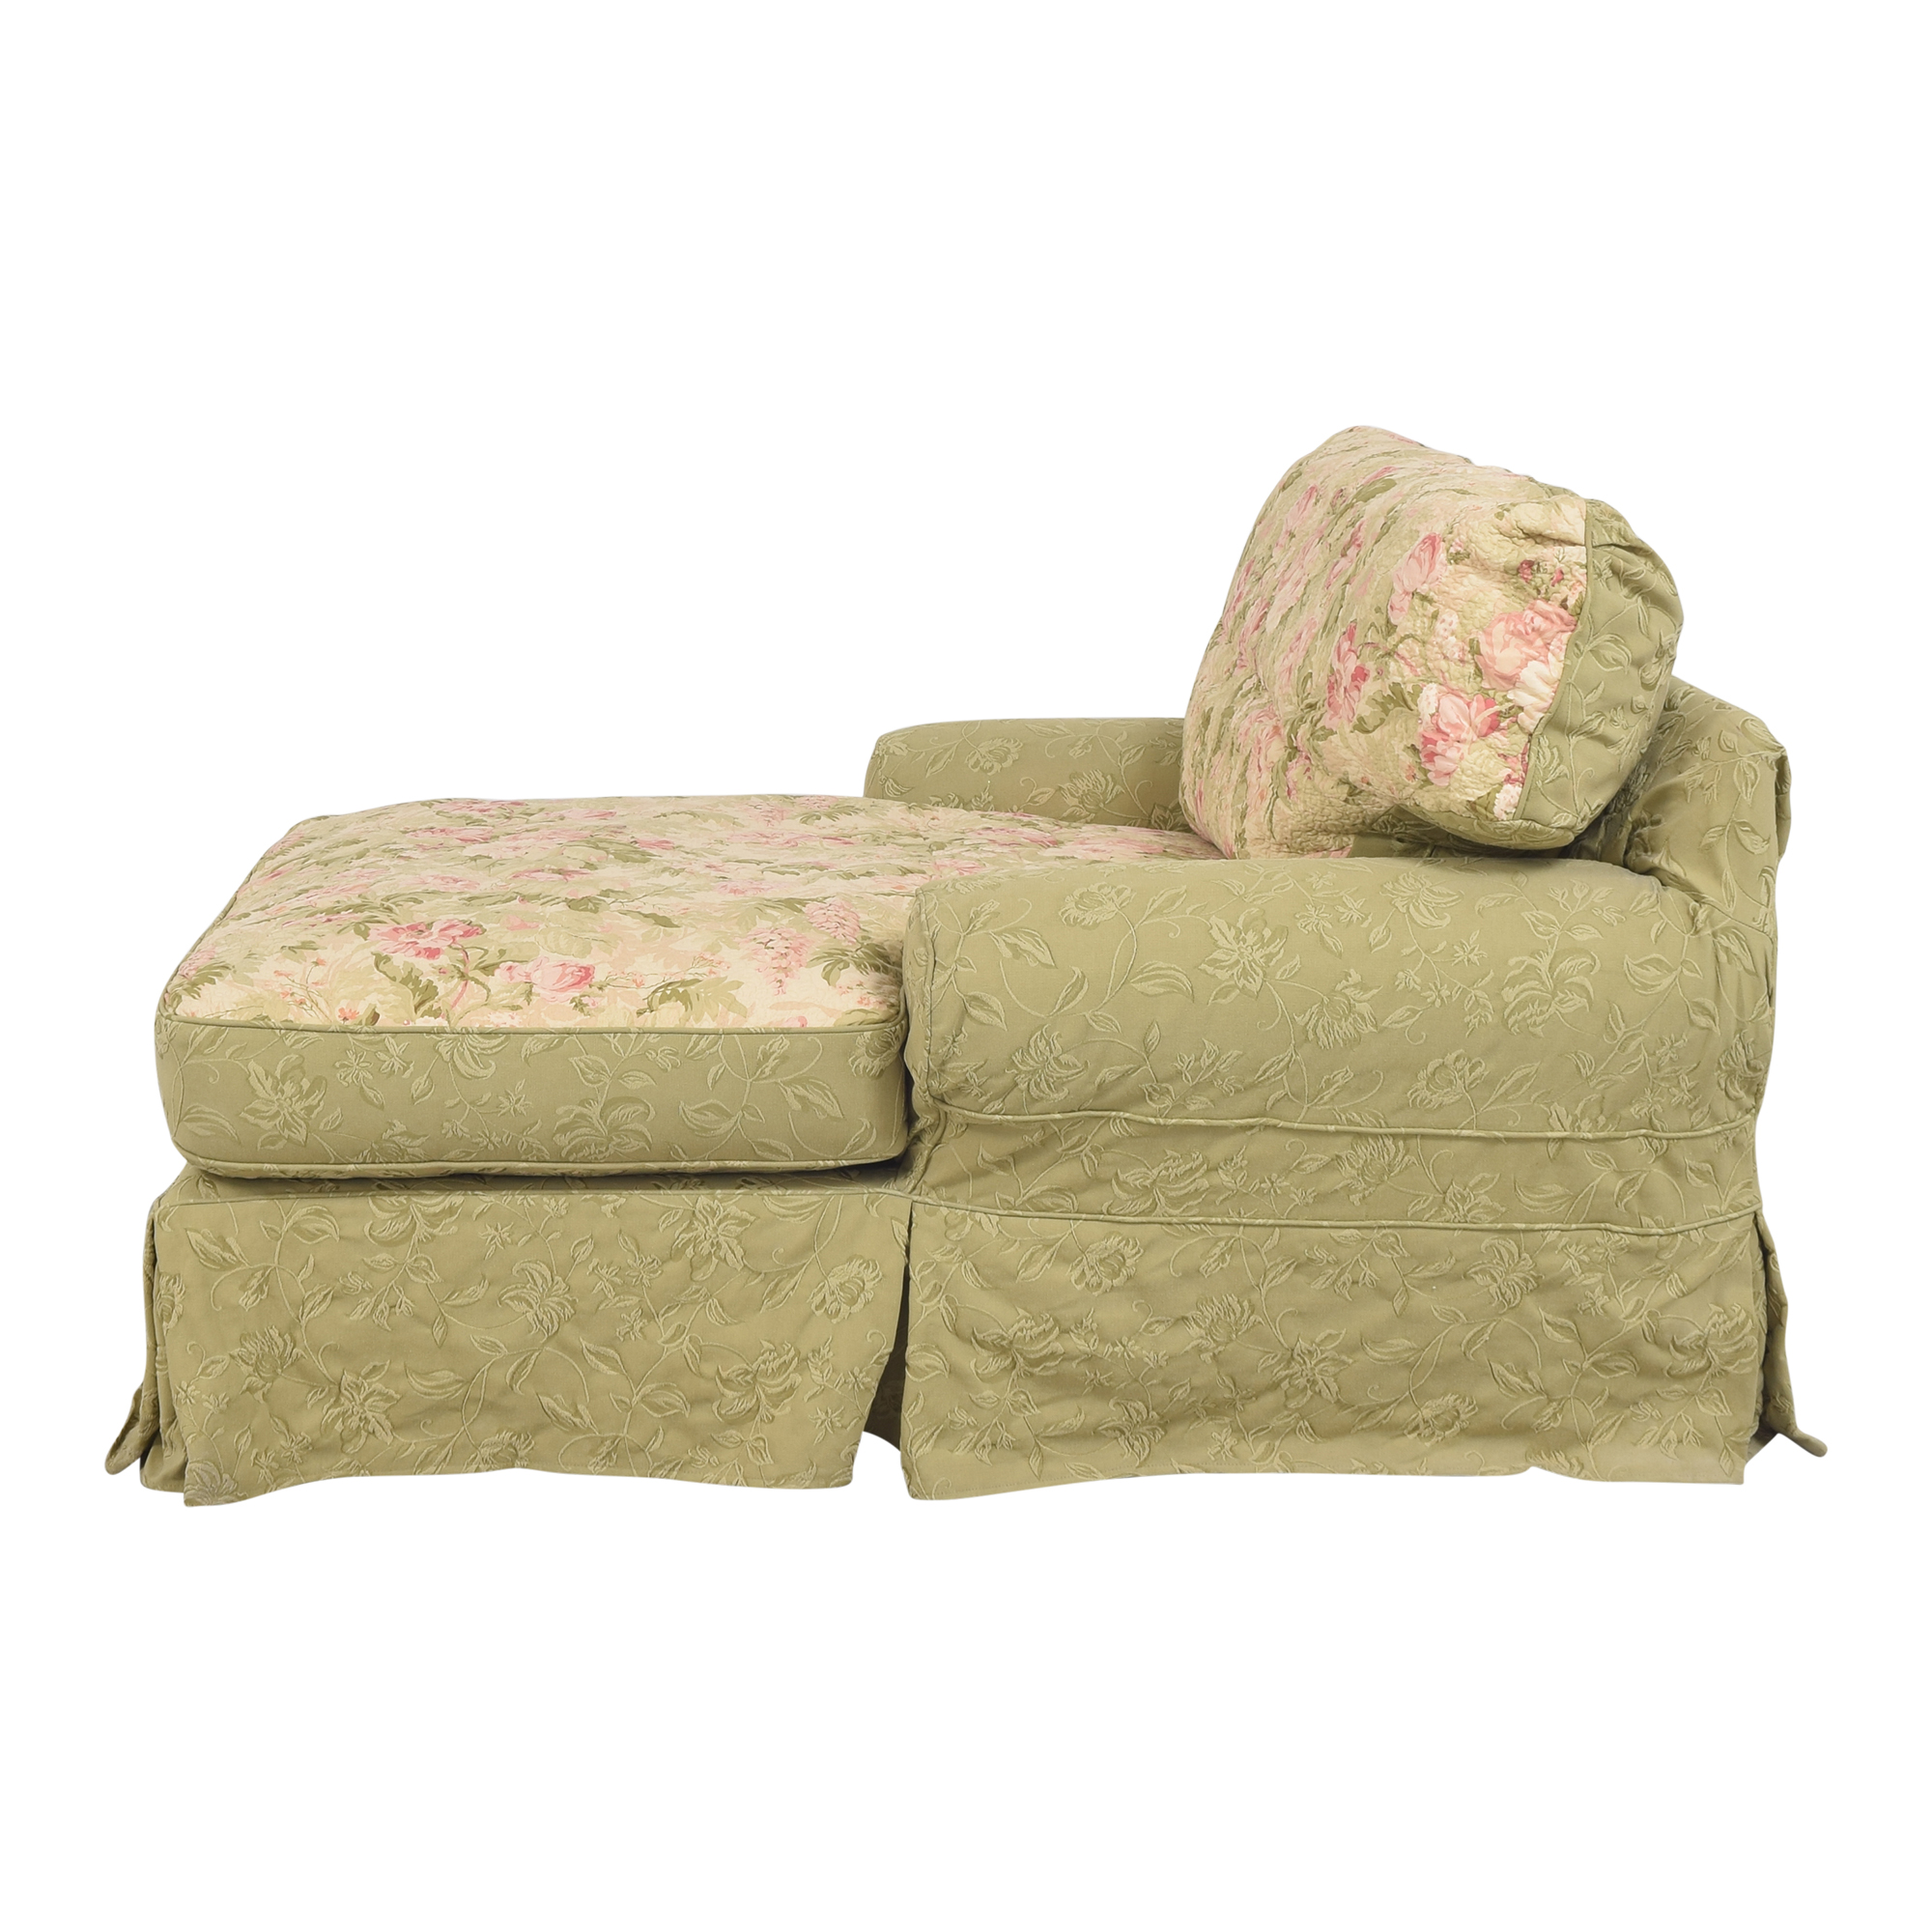 arhaus arhaus chaise lounge sofas